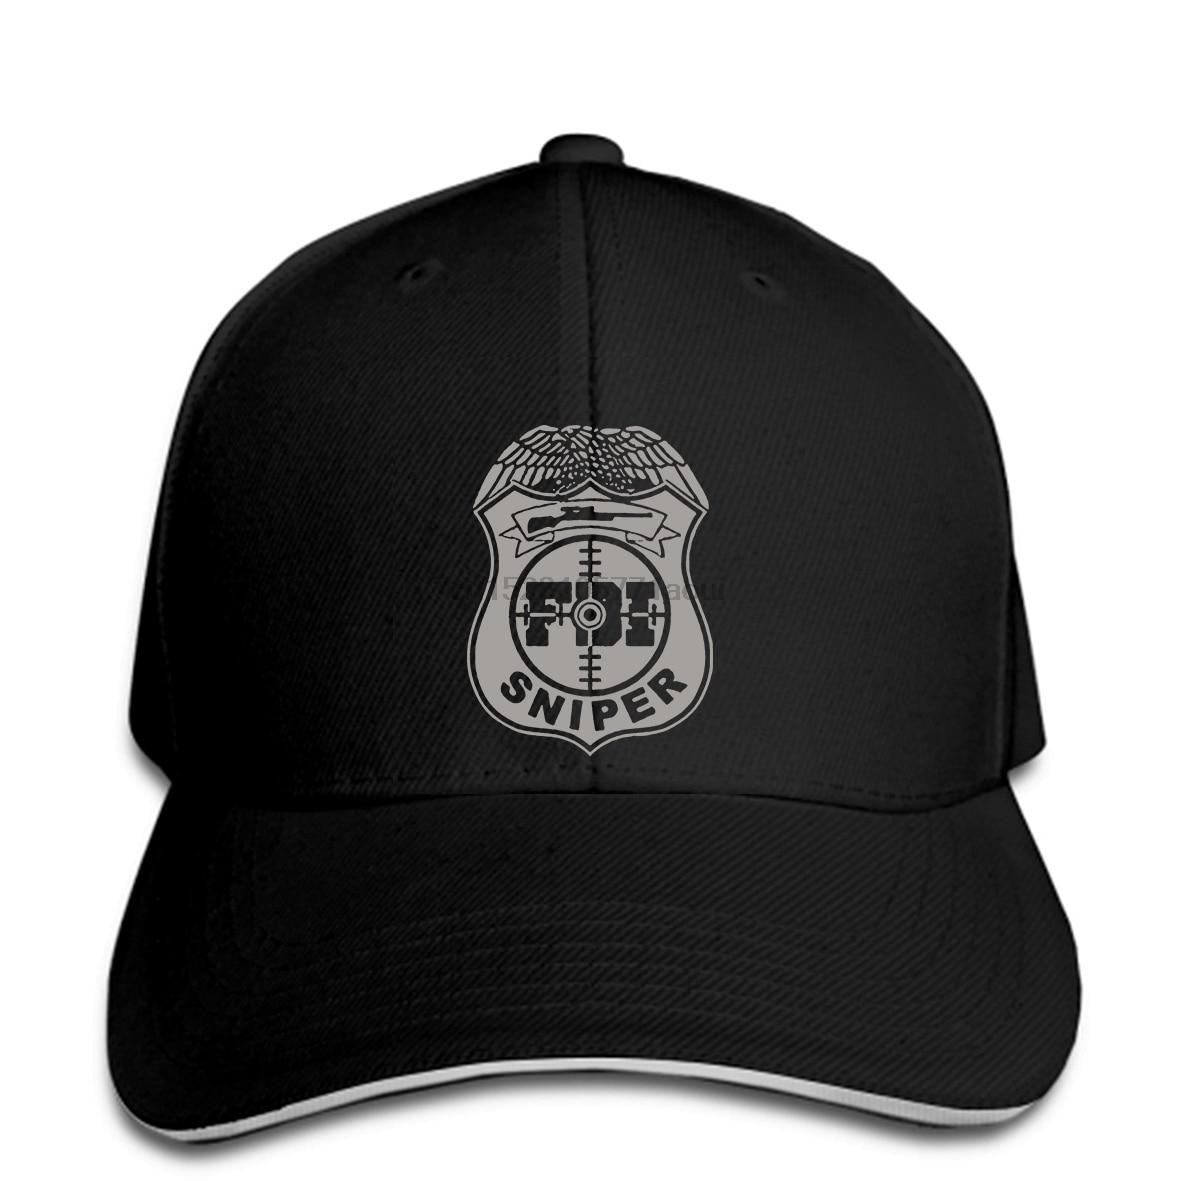 Baseball cap New FBI Sniper Team snapback Men Streetwear